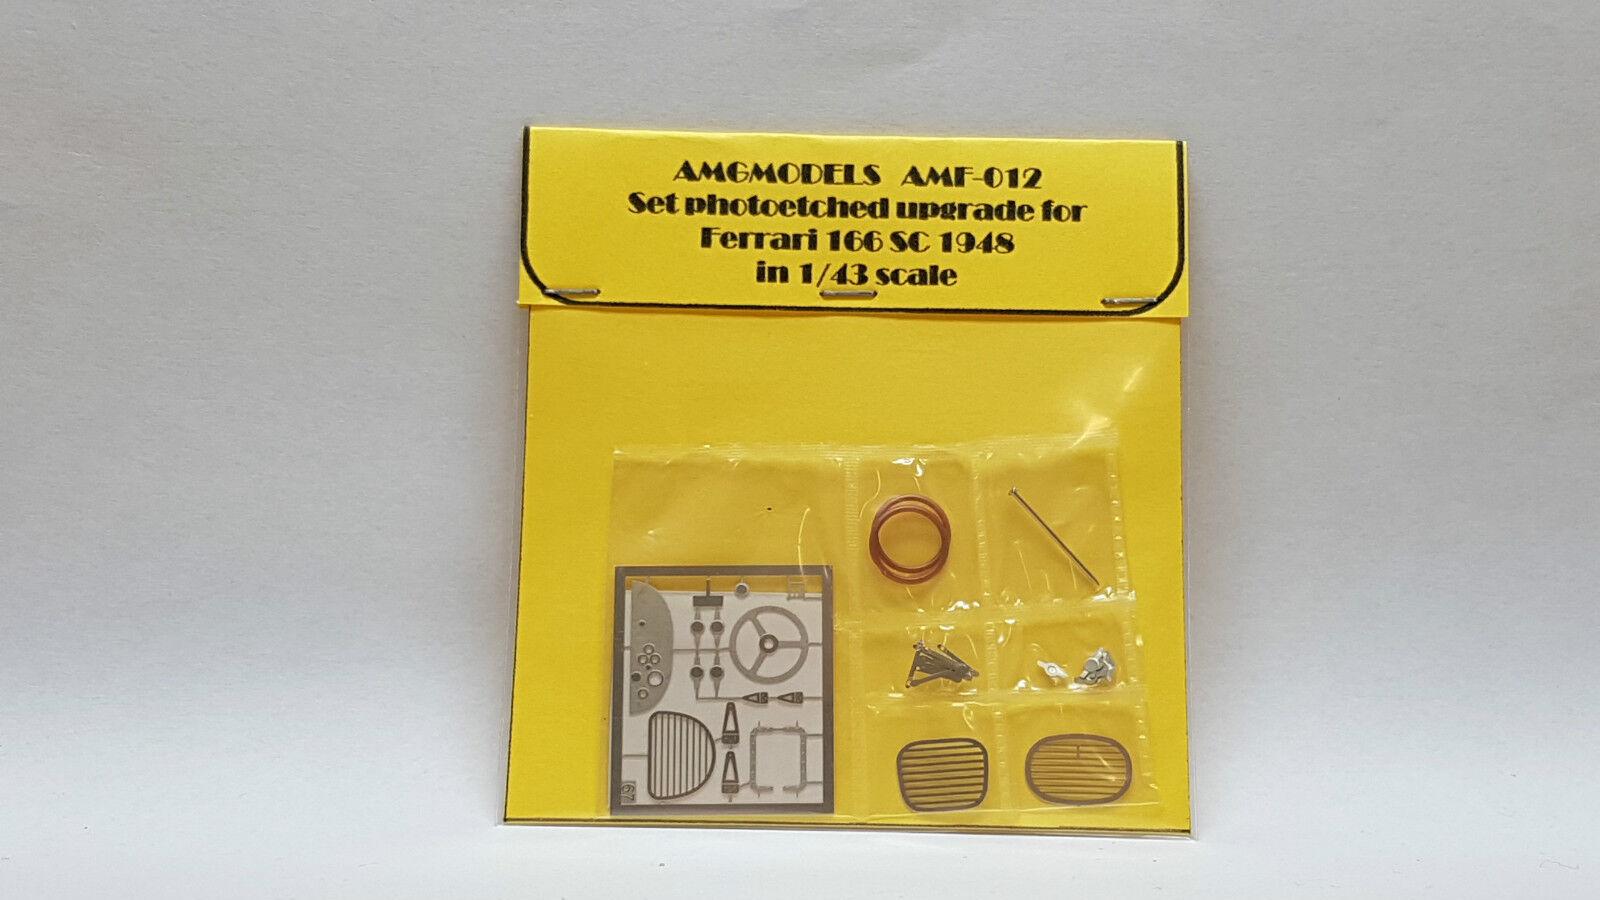 SET P E UPGRADE FOR FERRARI 166 SC '48 1 43 BY AMG AMF-012 N  AMR BOSICA MG TRON